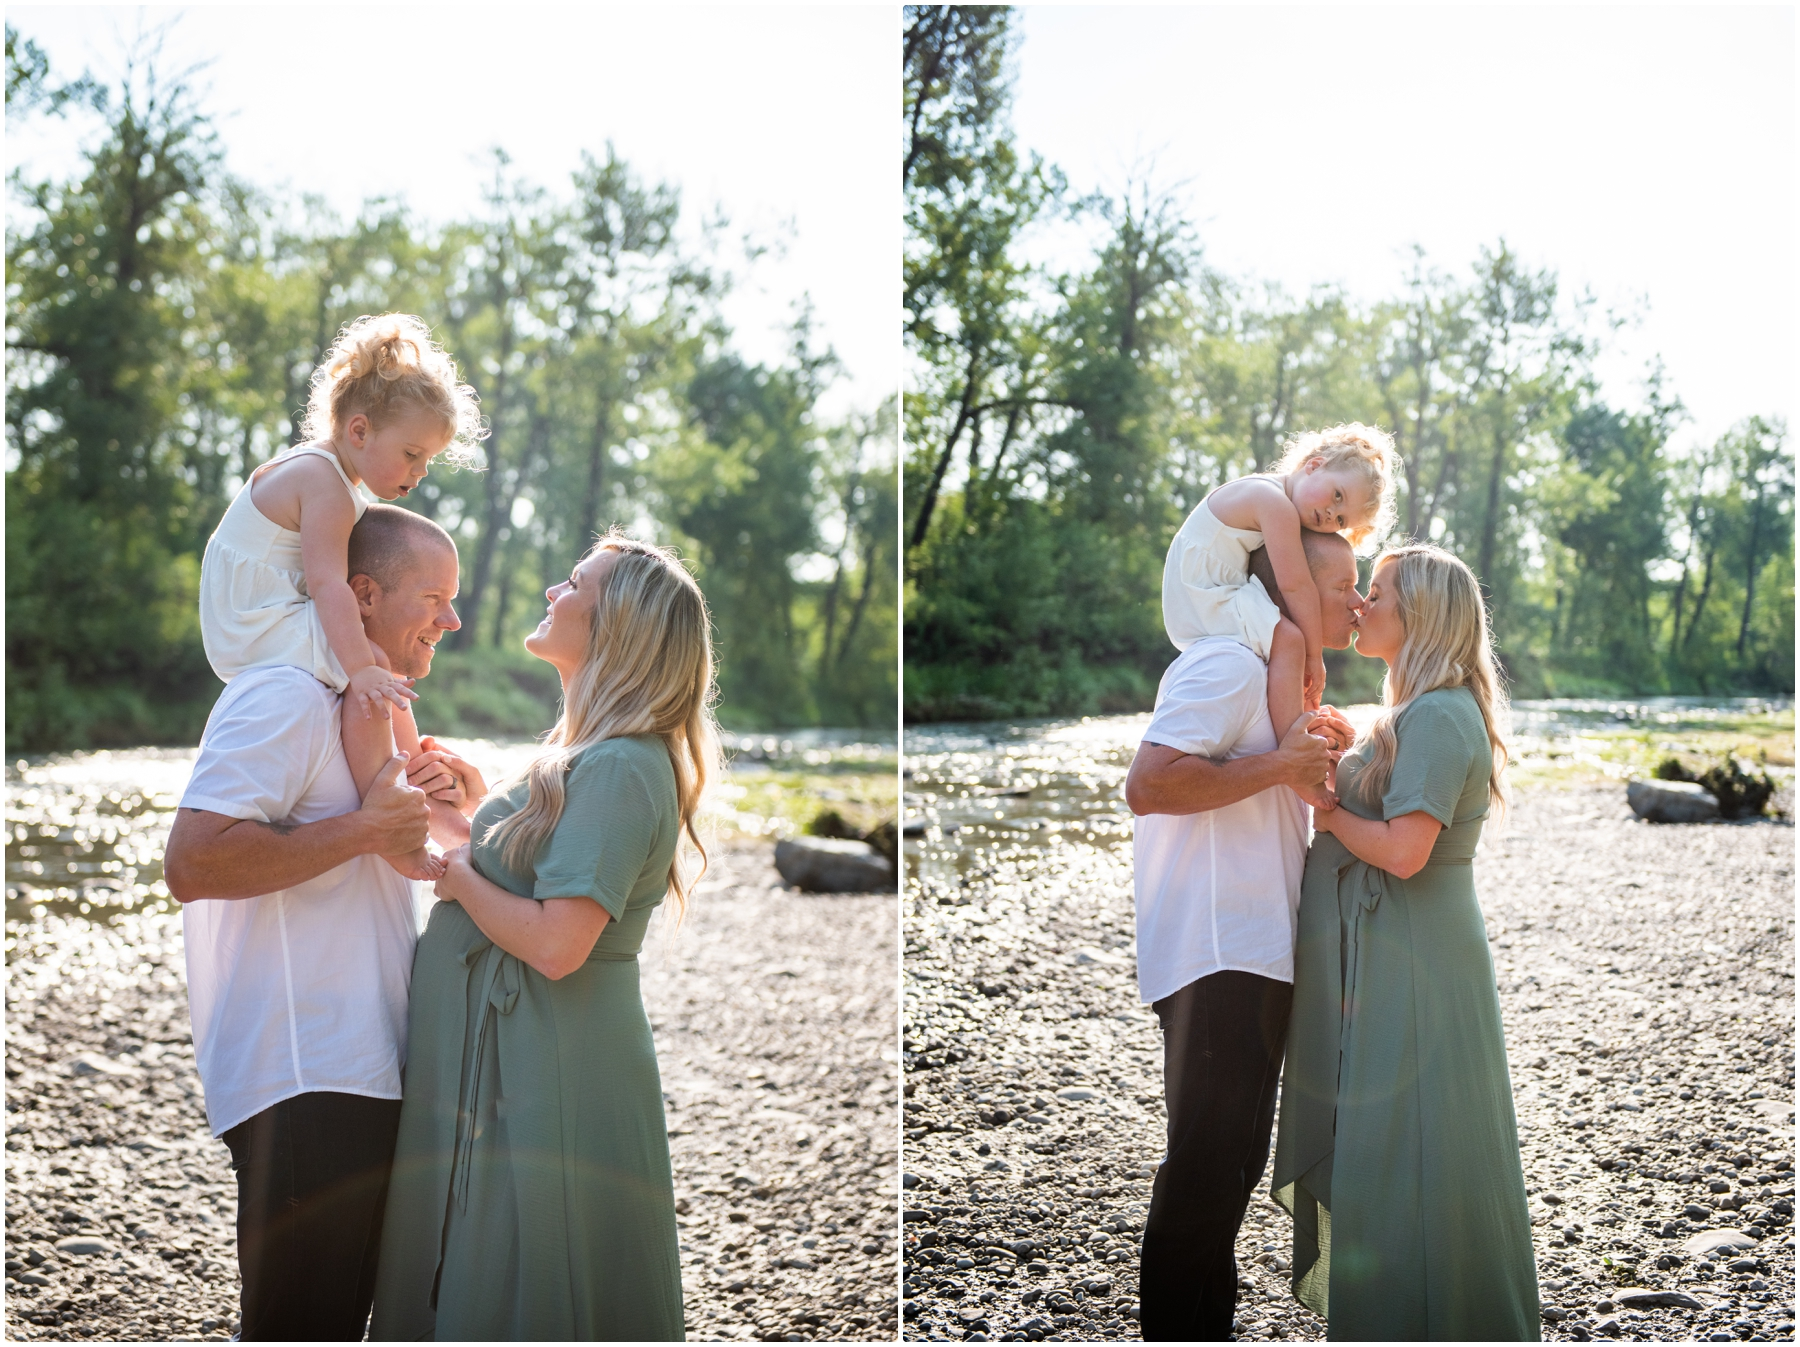 Calgary Summer Maternity & Newborn Photography